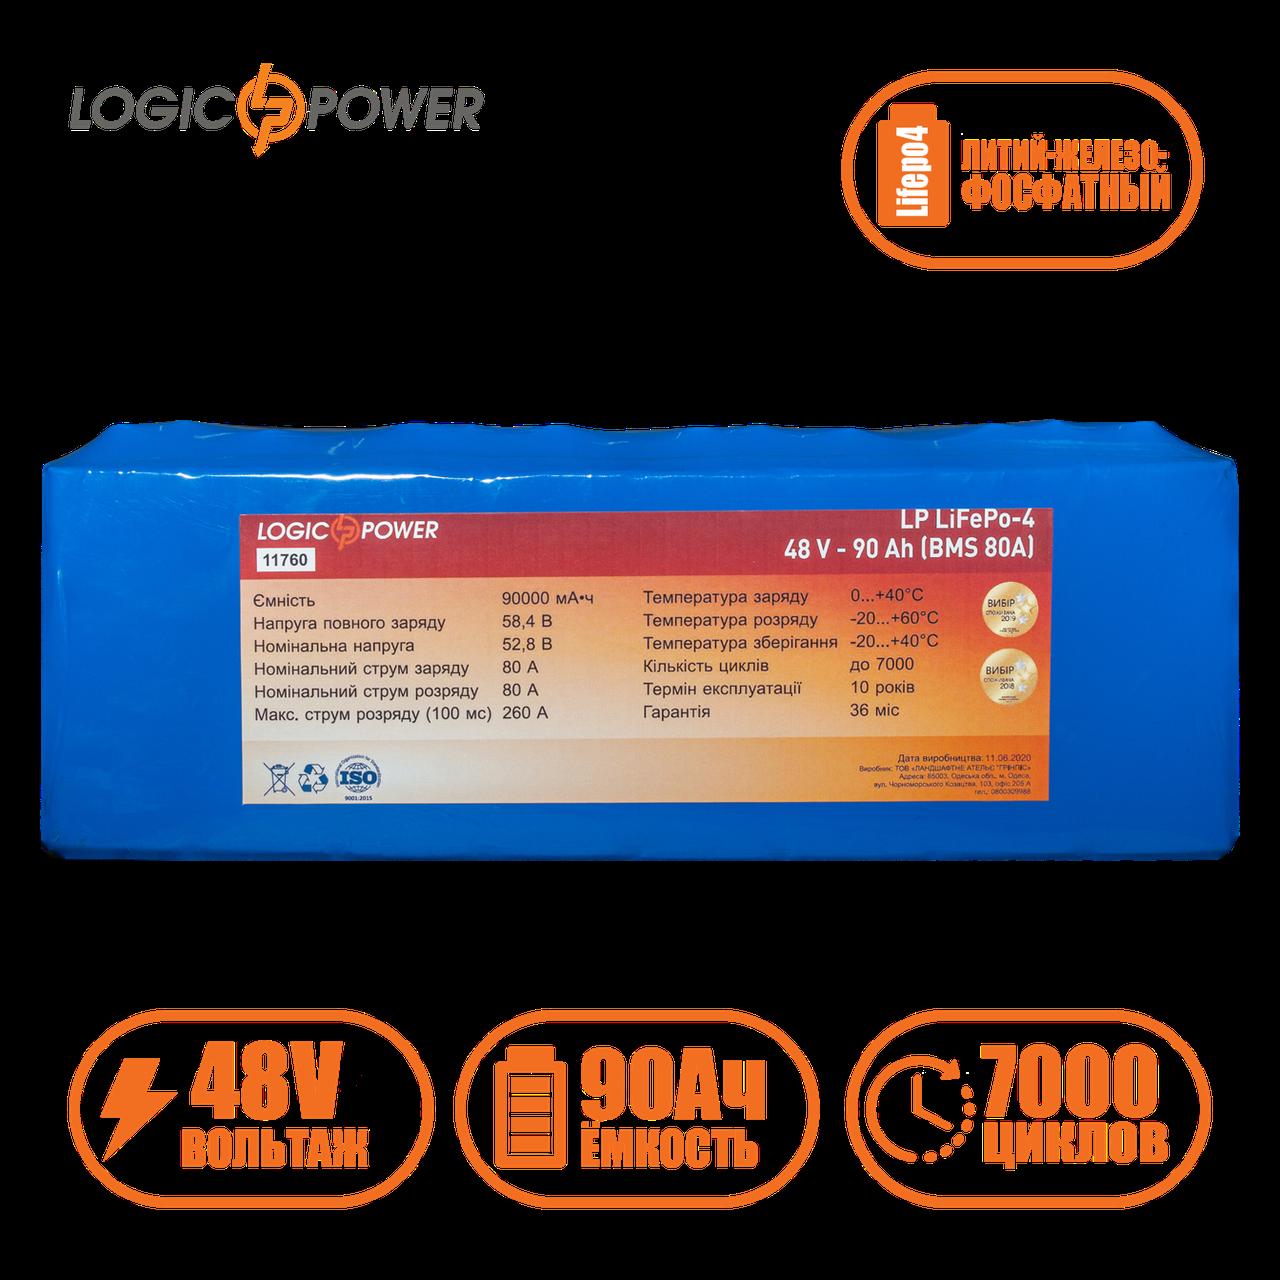 Аккумулятор LPLiFePO4 48 V - 90 Ah (BMS 80A)